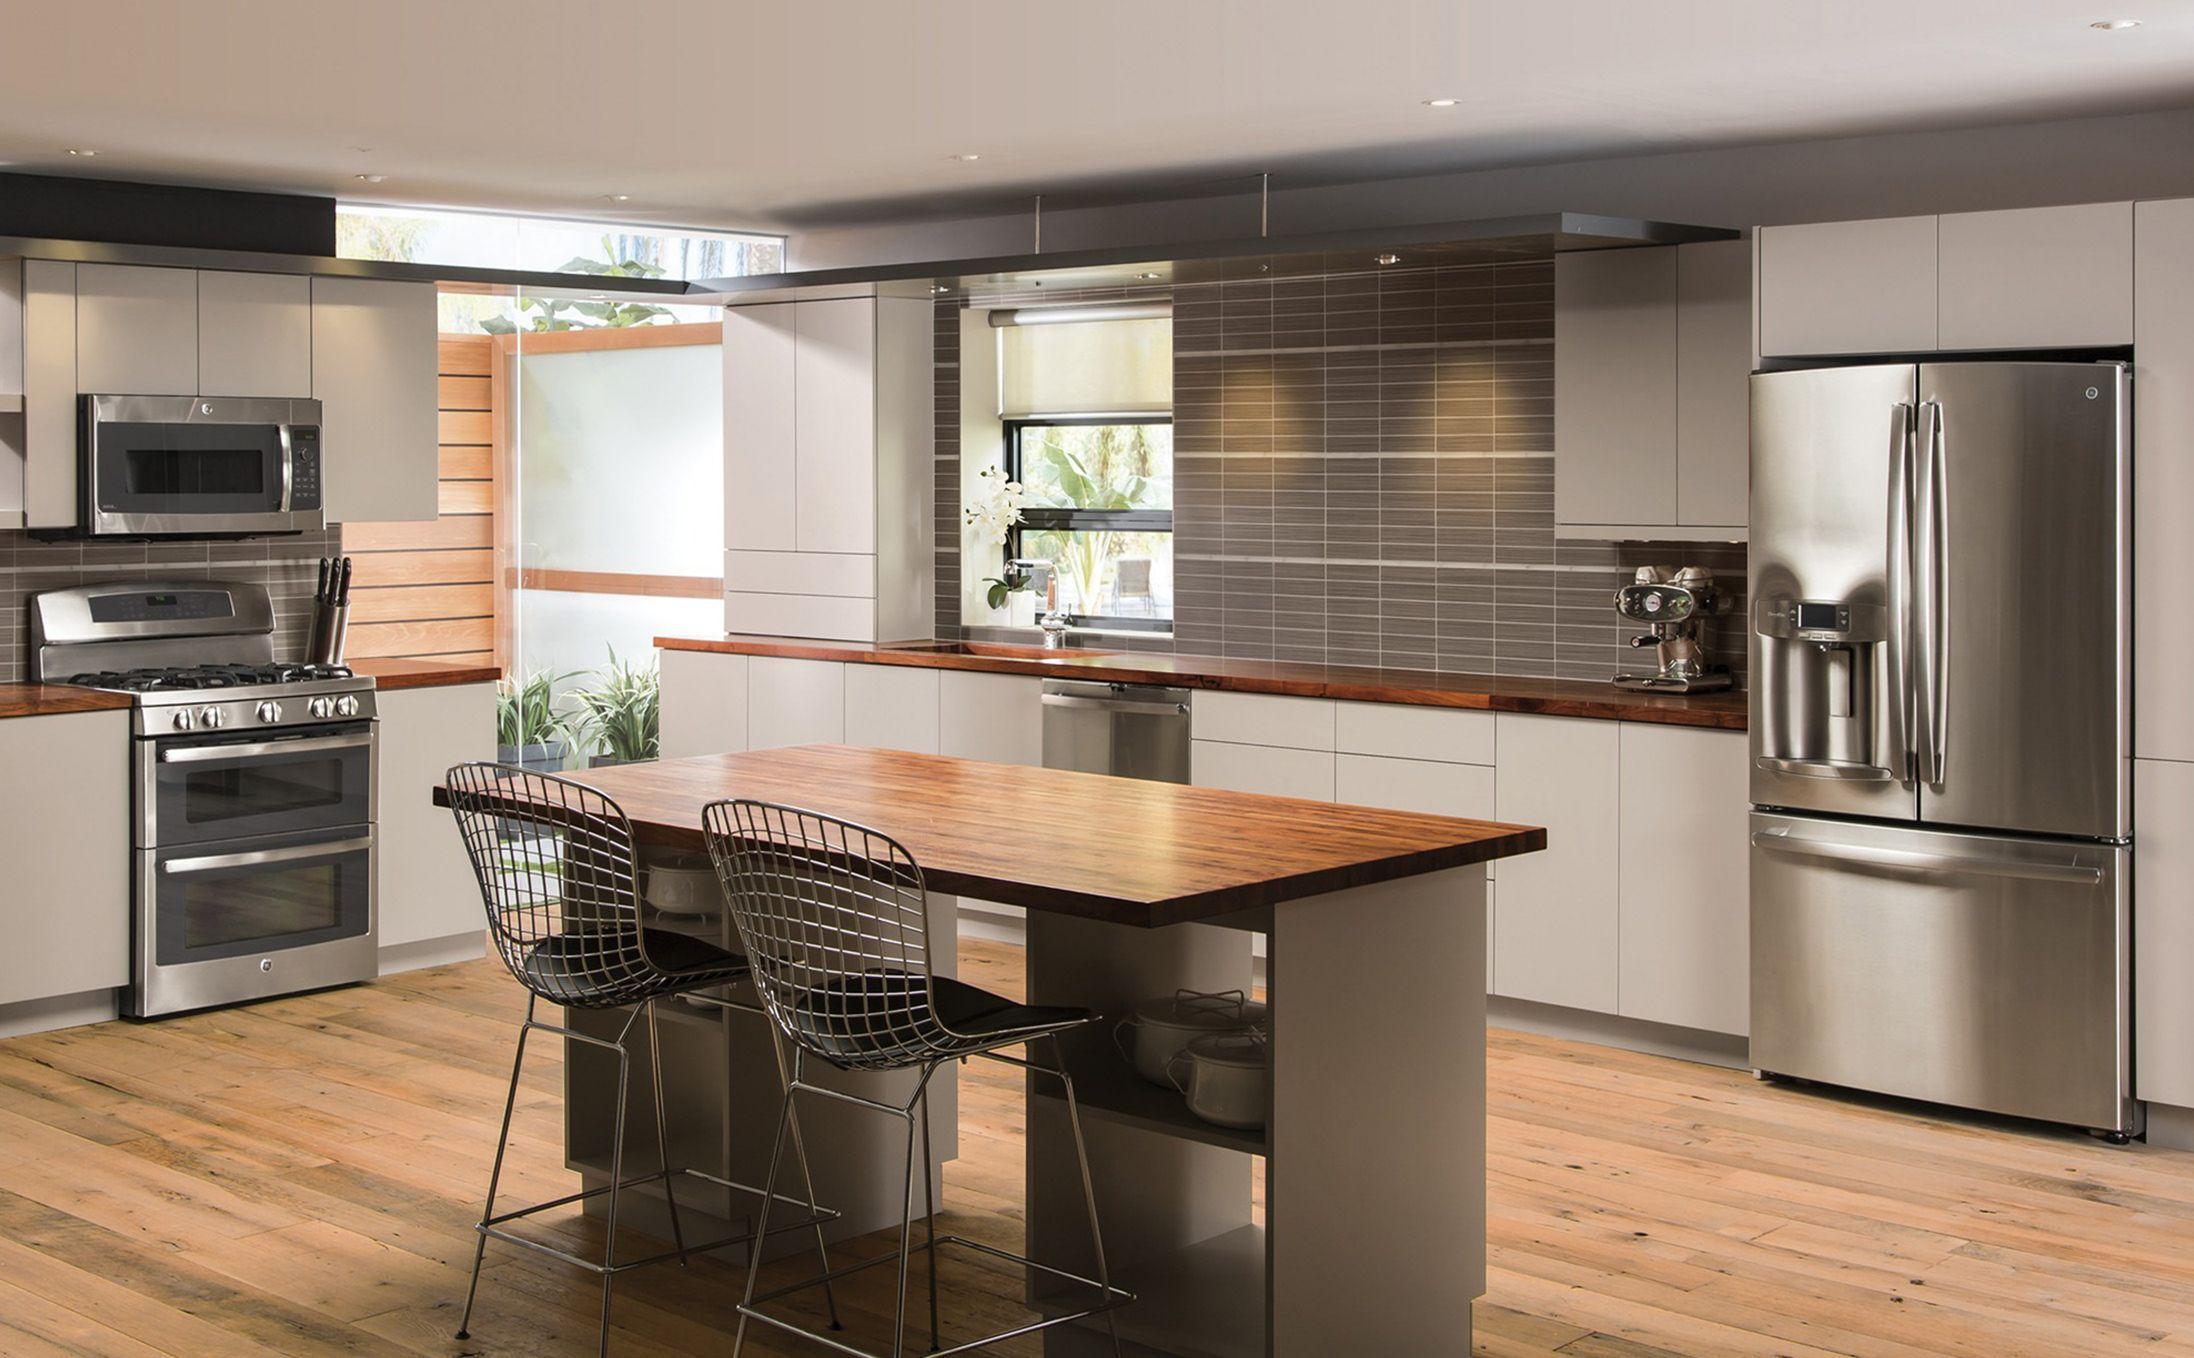 interesting 10 minimalist kitchen set design ideas for your minimalist home with images on kitchen ideas minimalist id=24616